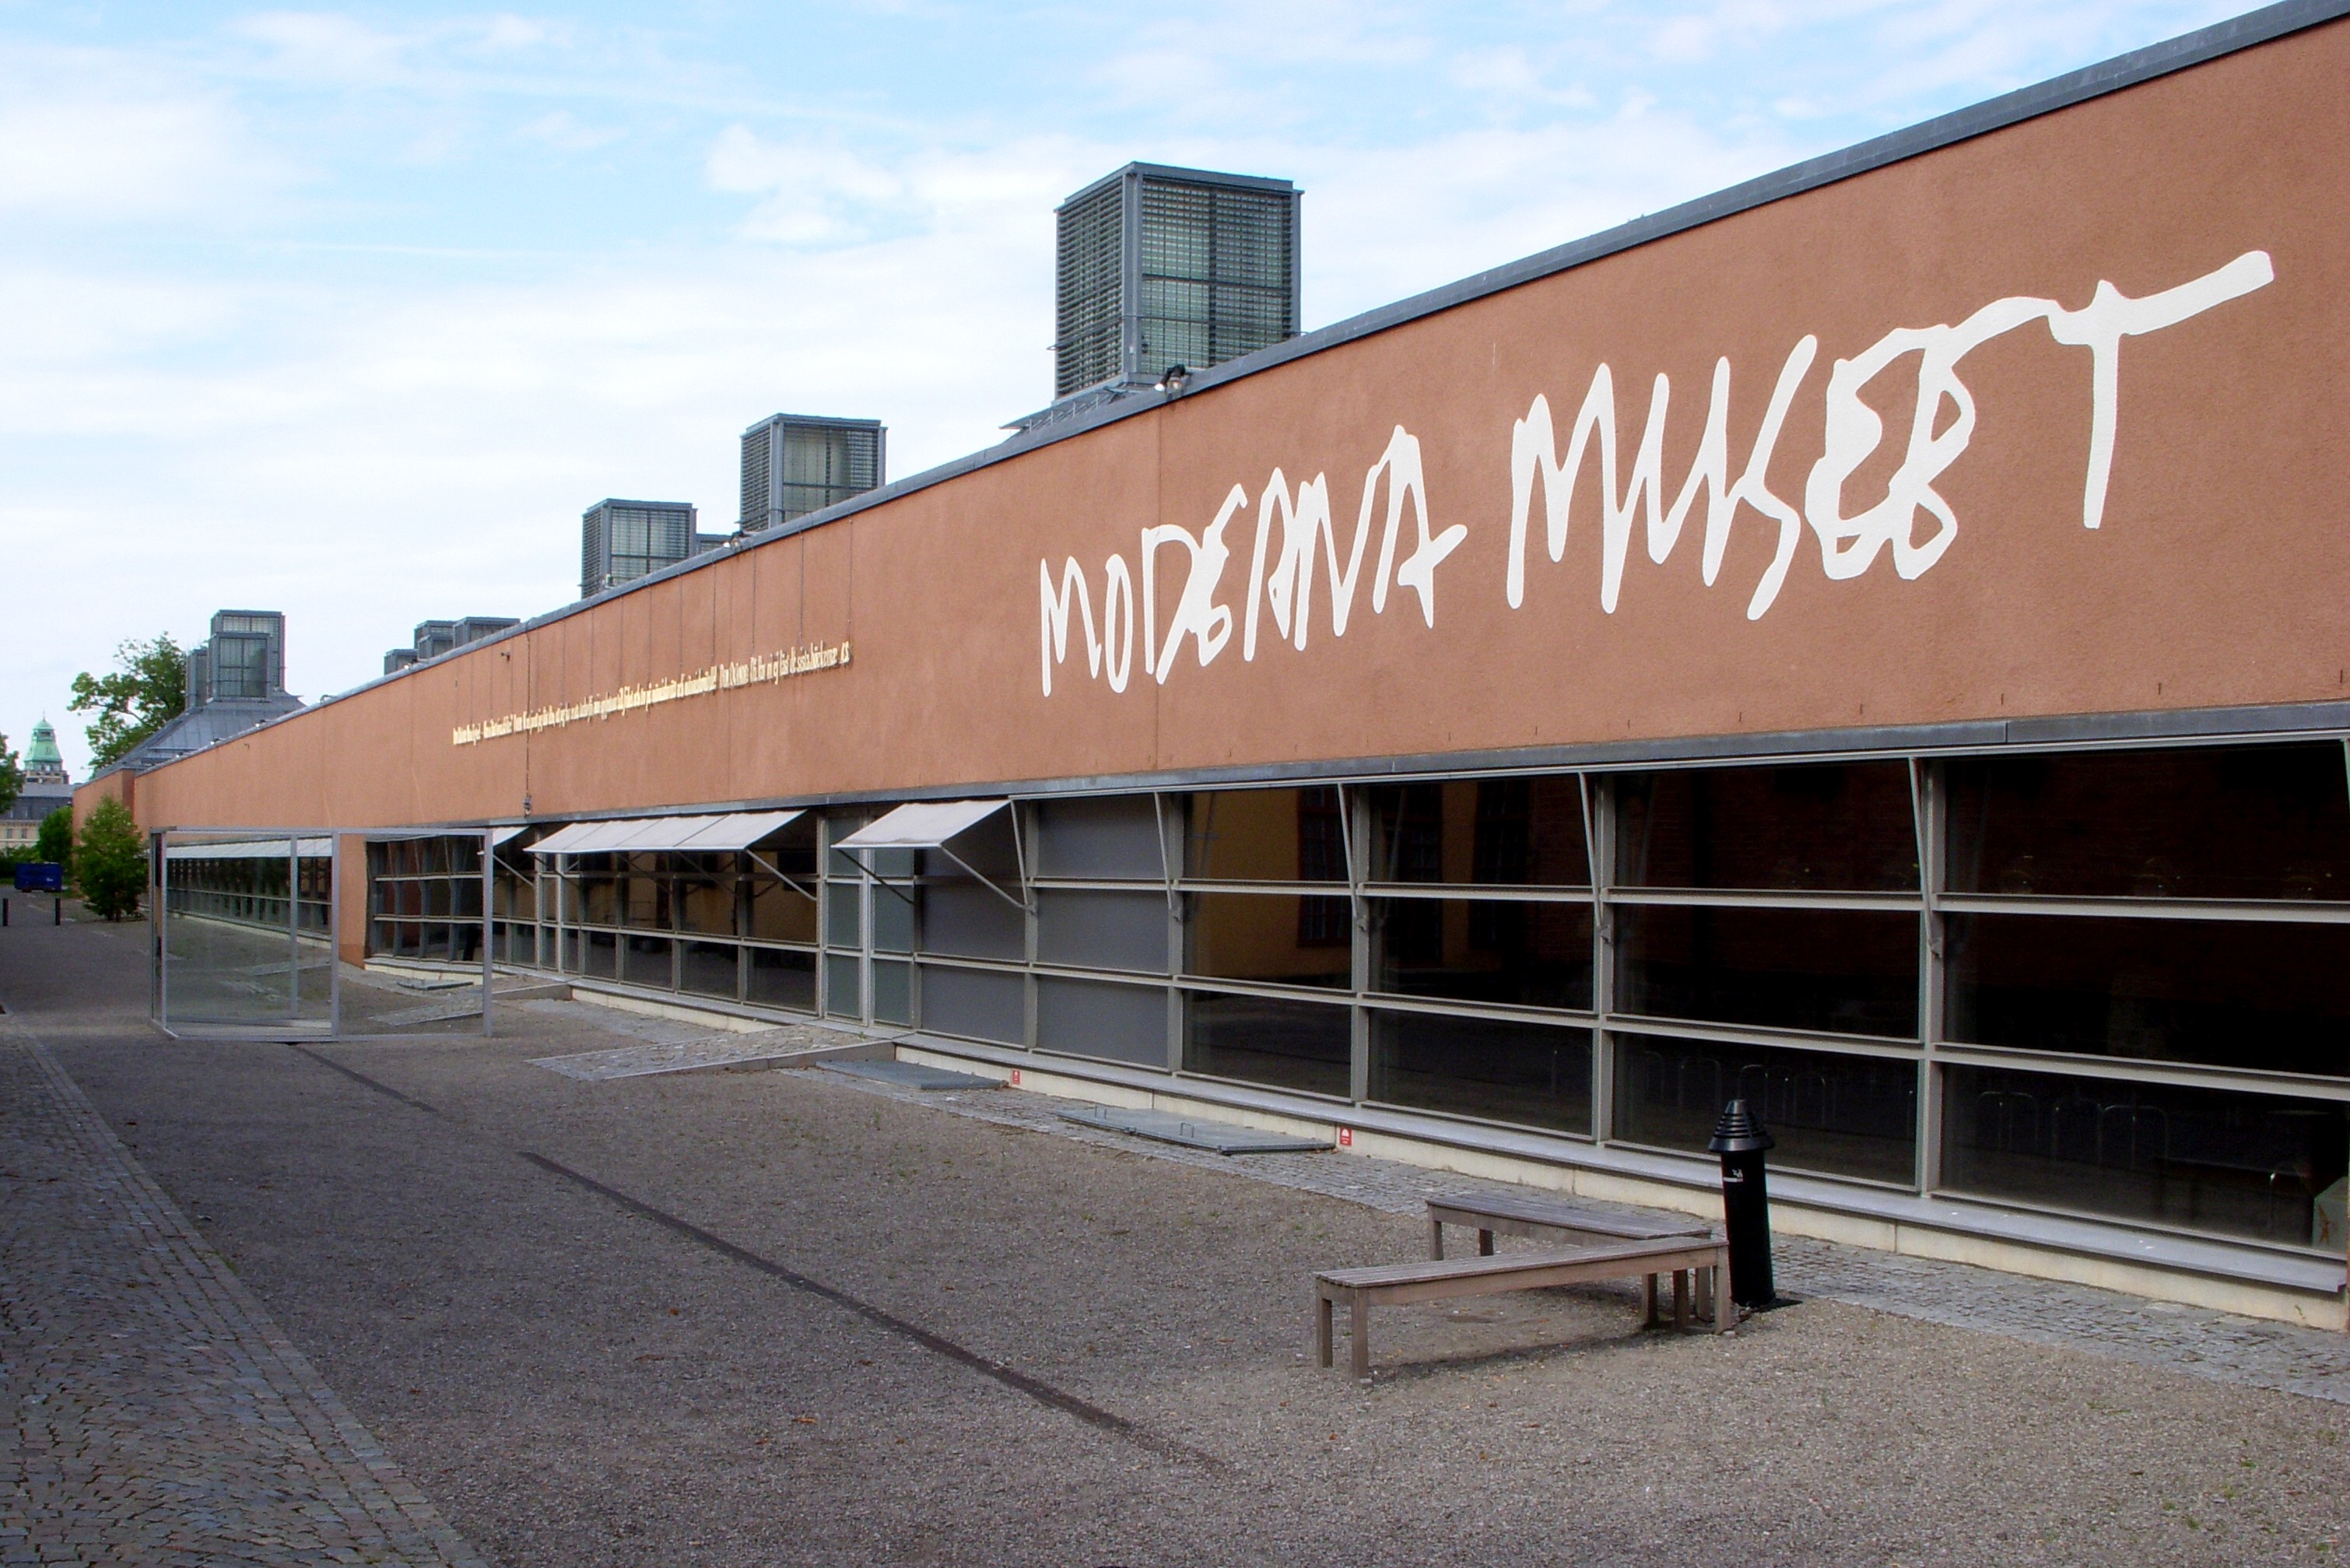 File:Moderna museet, 2009.jpg